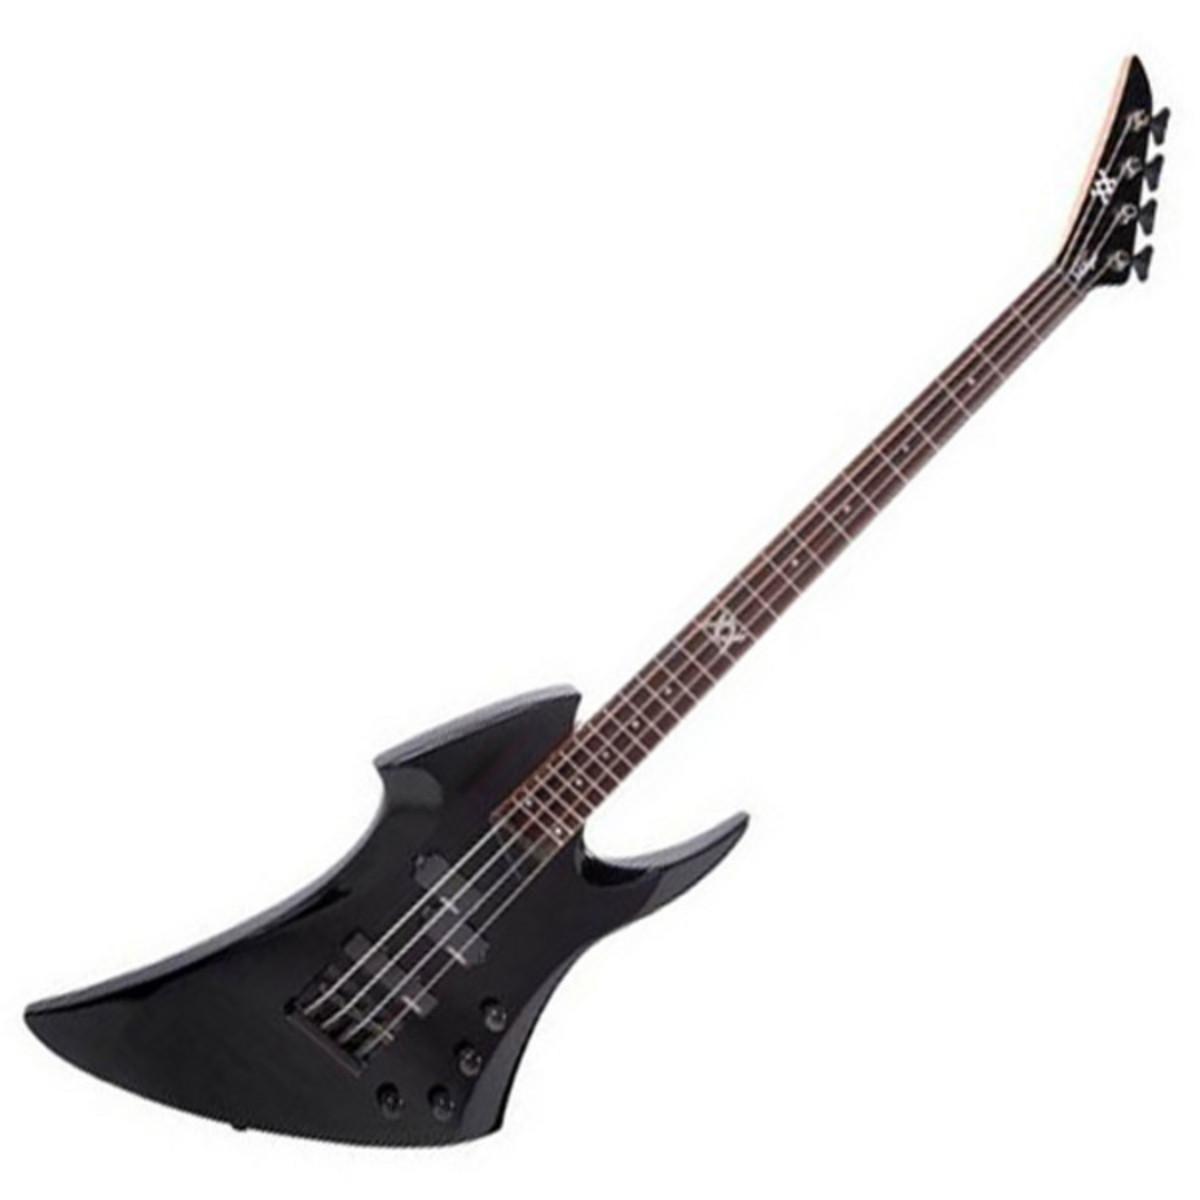 Guitarras electricas Axxe Metal Vintage Gear4music